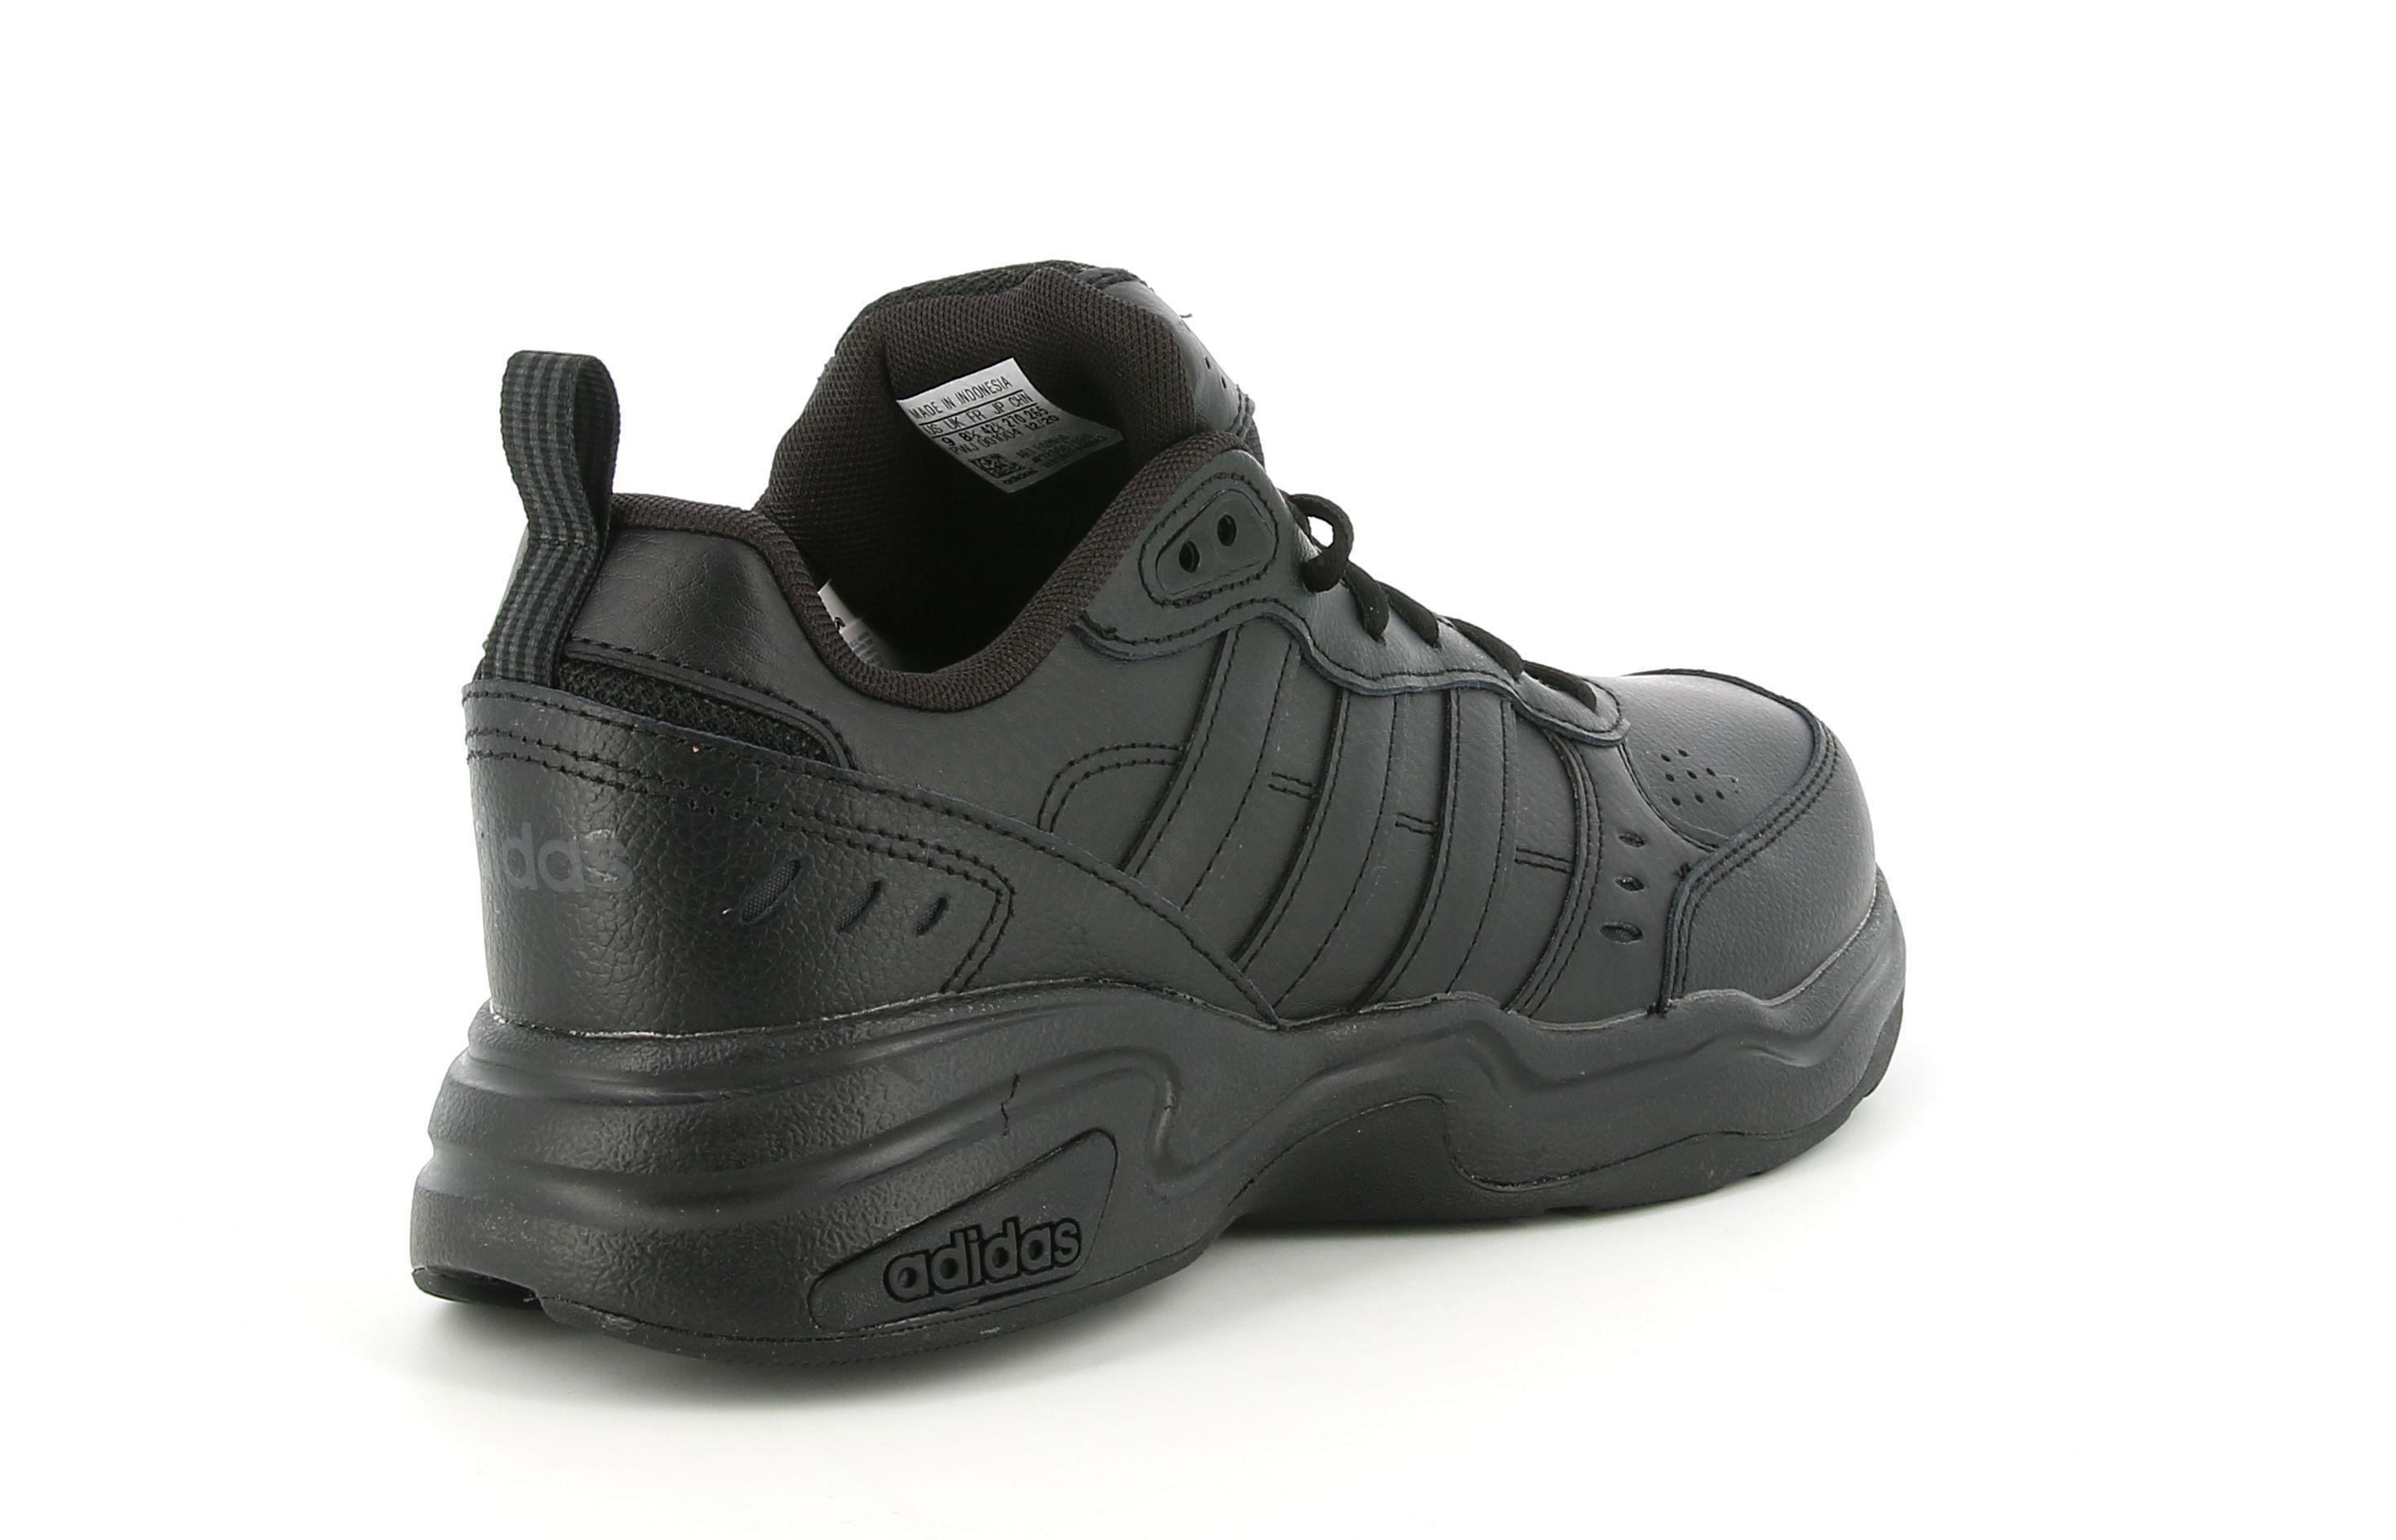 adidas adidas eg2656 strutter cblack/gresix scarpa sportiva da uomo nero